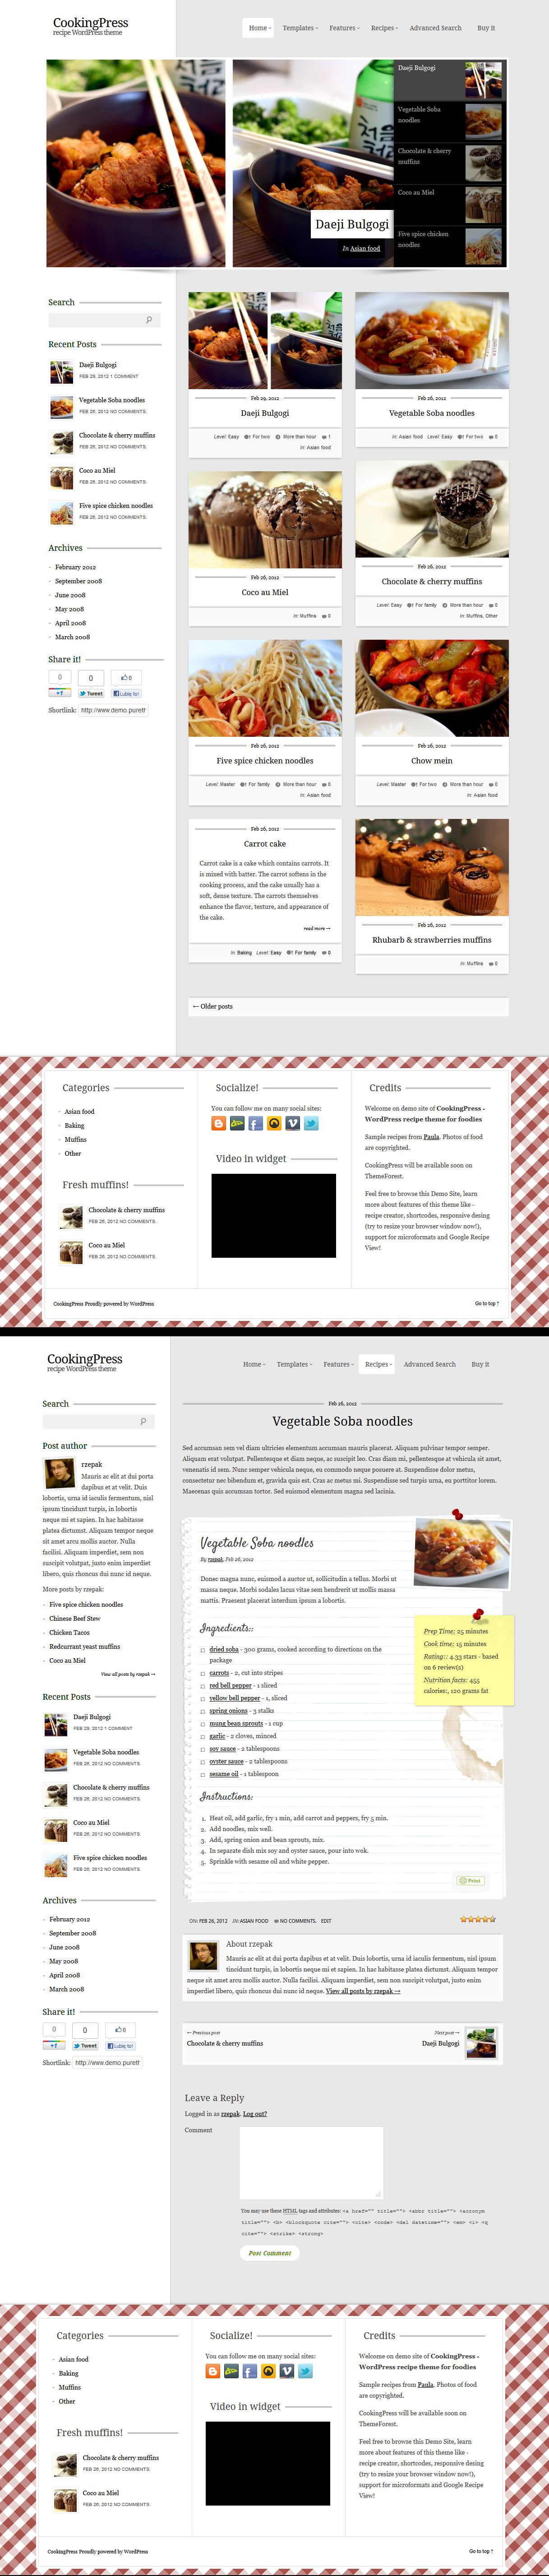 CookingPress  Recipe and  Food WordPress theme by rzepak